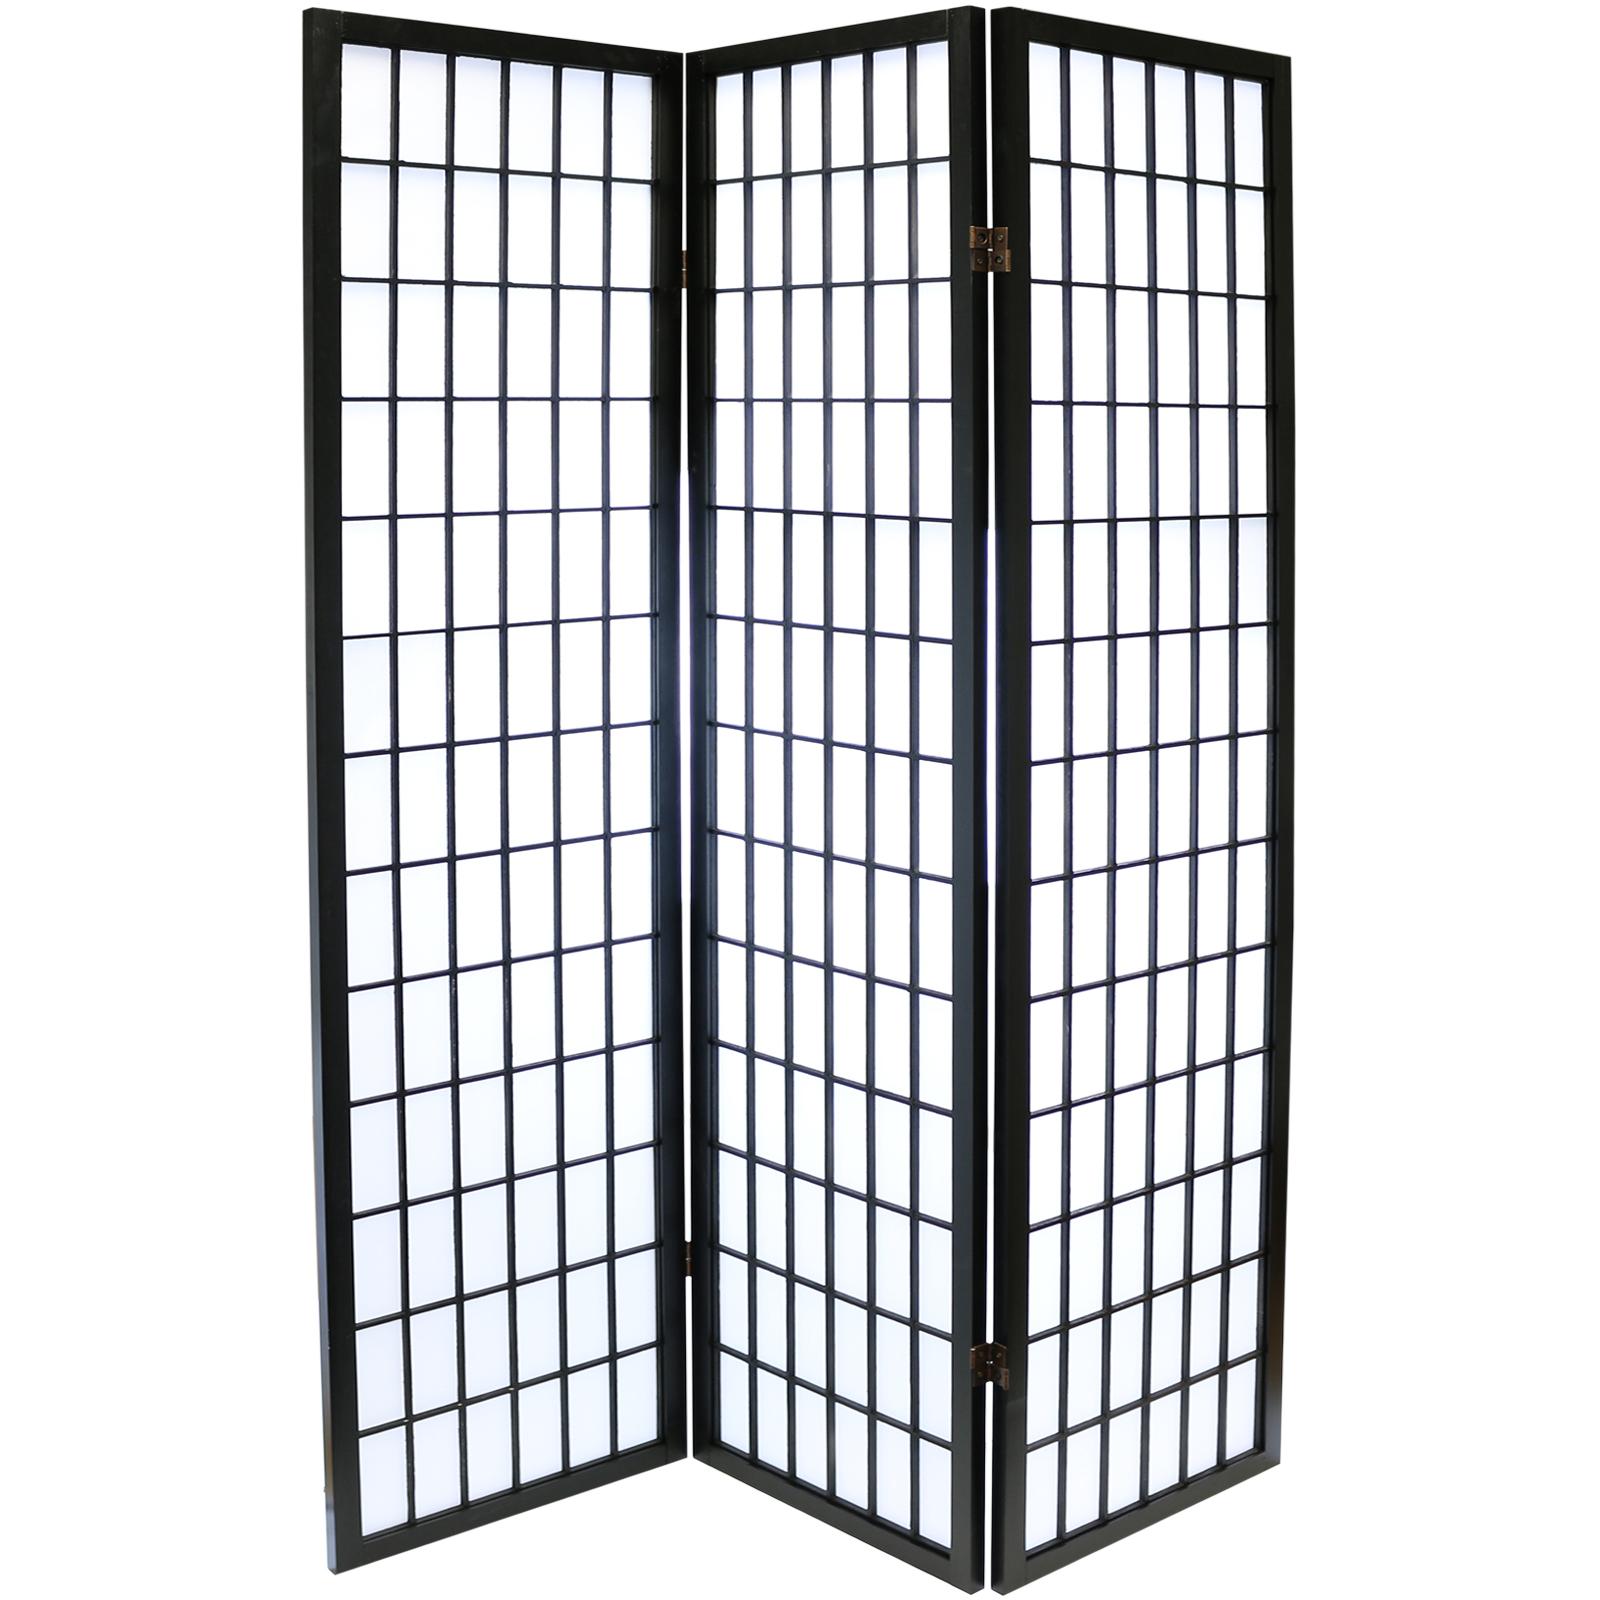 Chinese Shoji Screen ~ Hartleys black panel japanese tokyo room divider